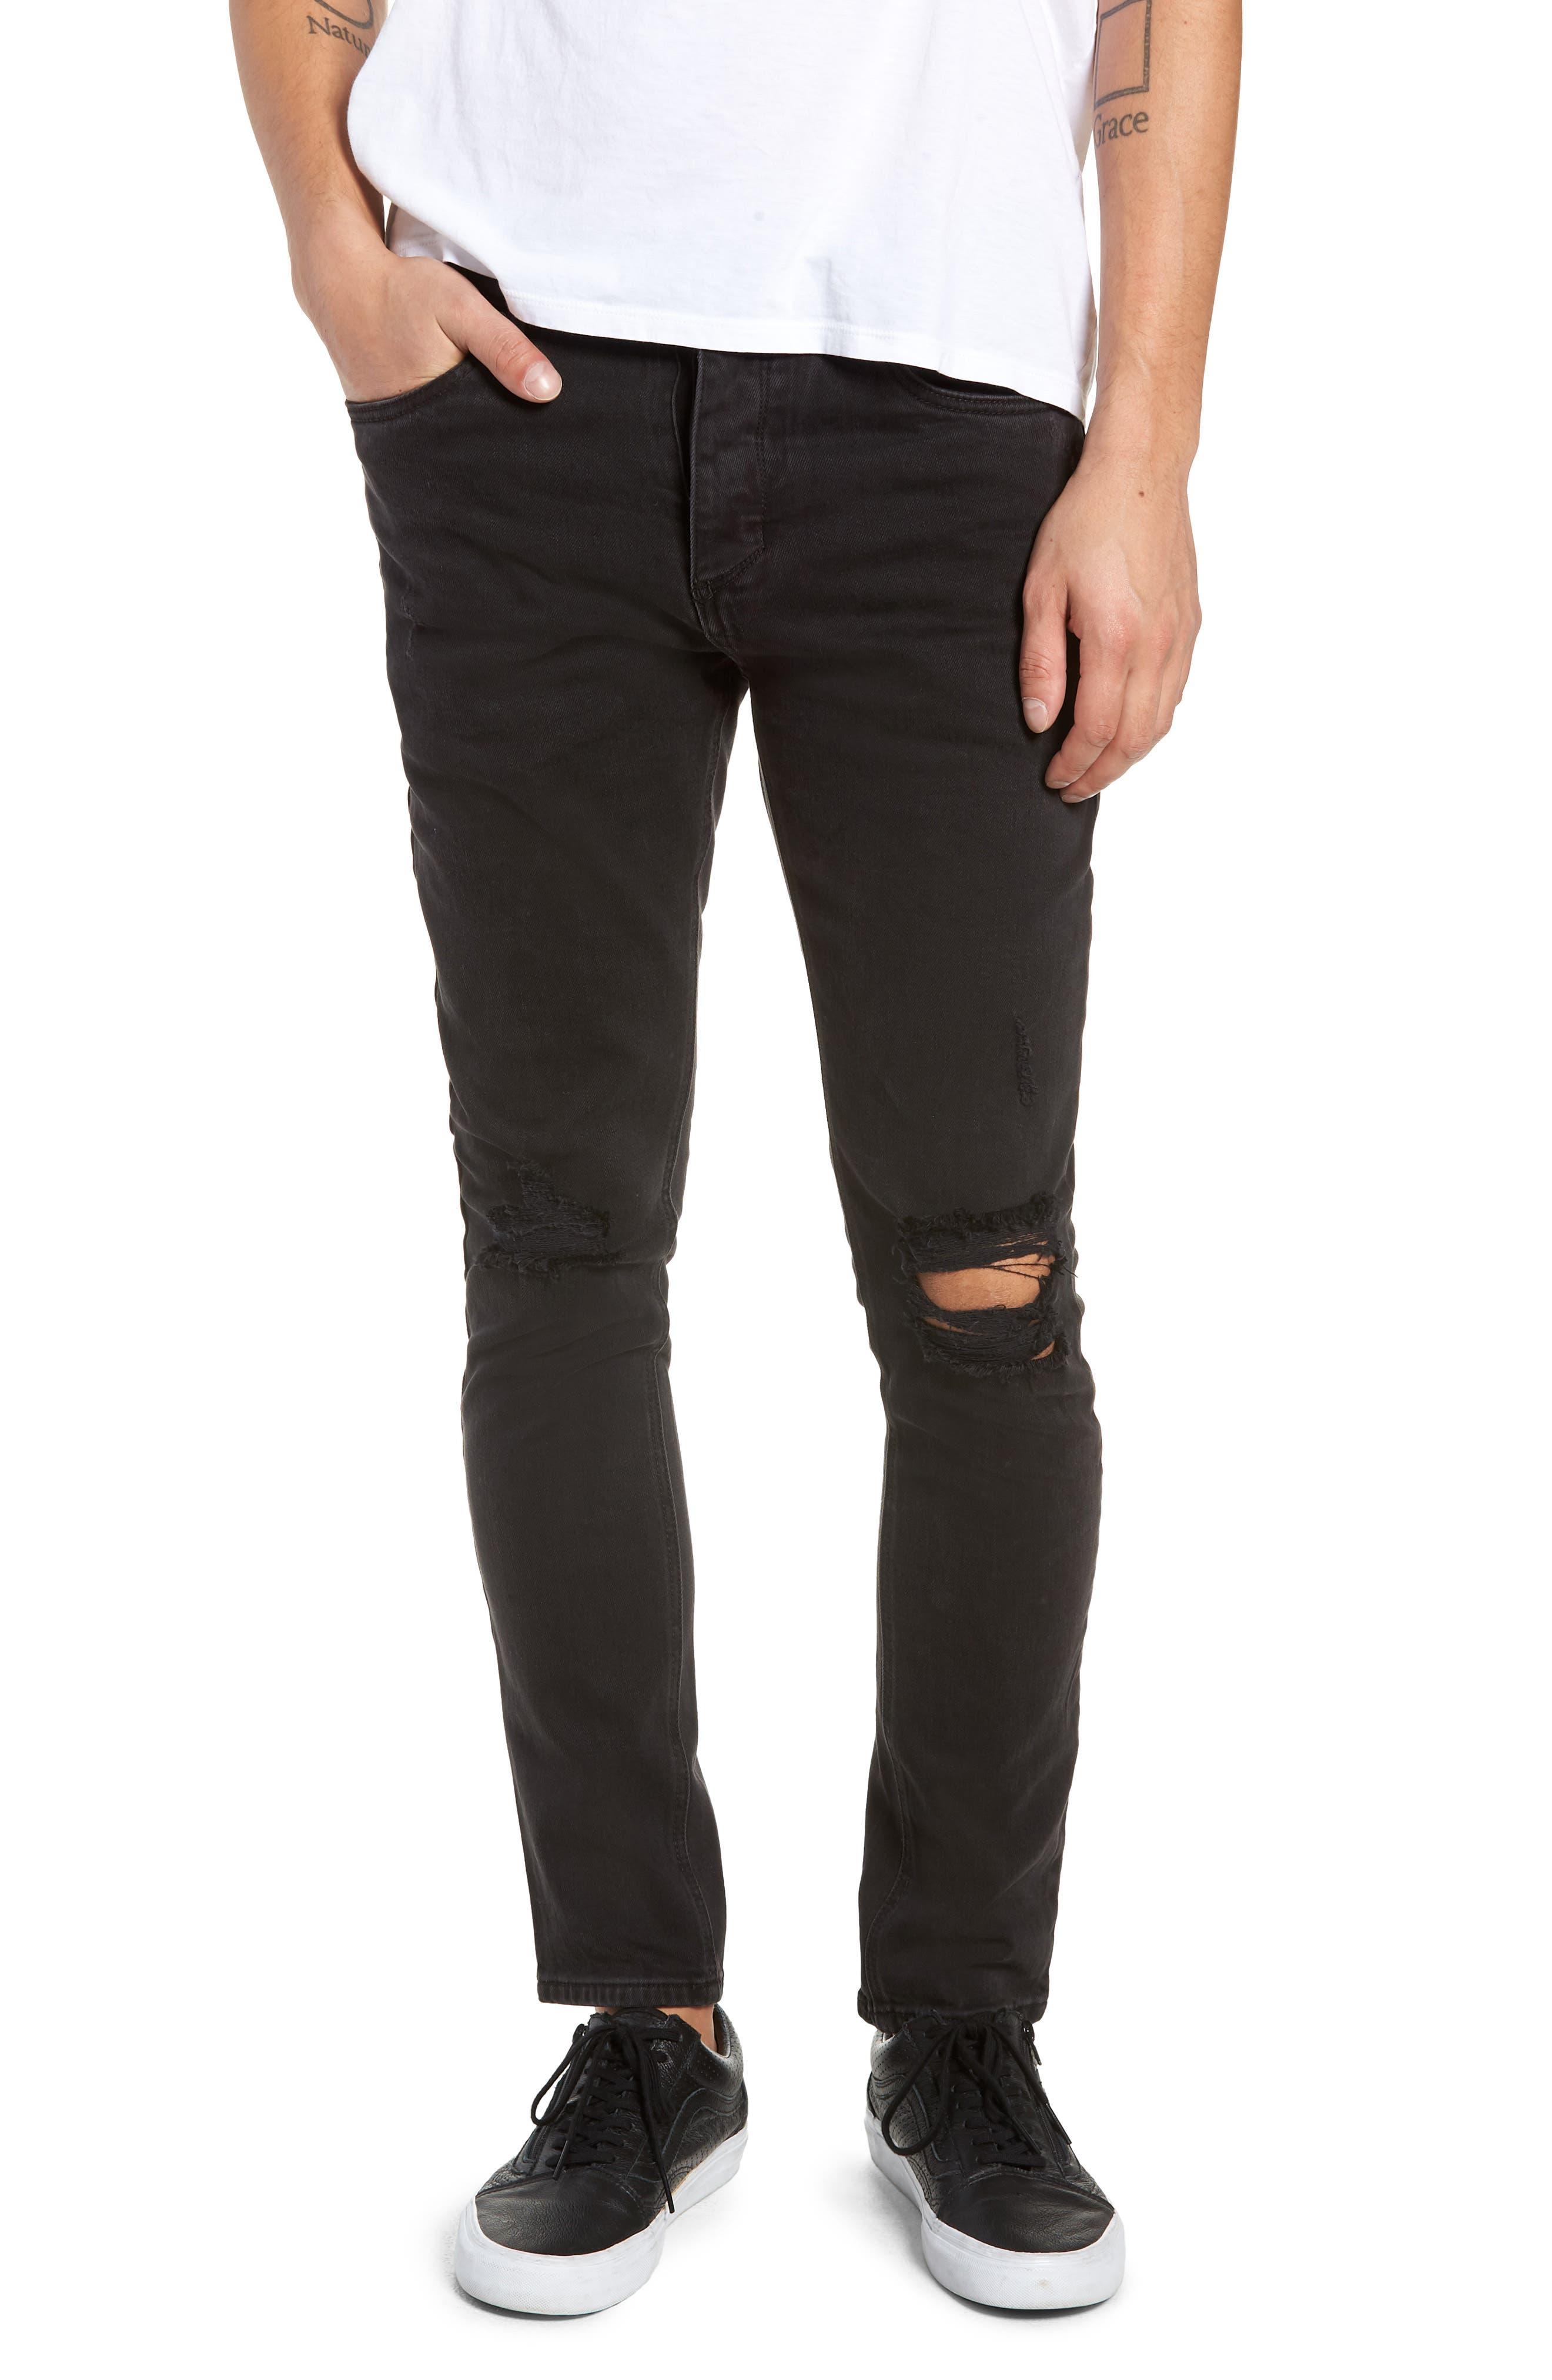 Joe Blow Slim Fit Jeans,                             Main thumbnail 1, color,                             BUSTED BLACK